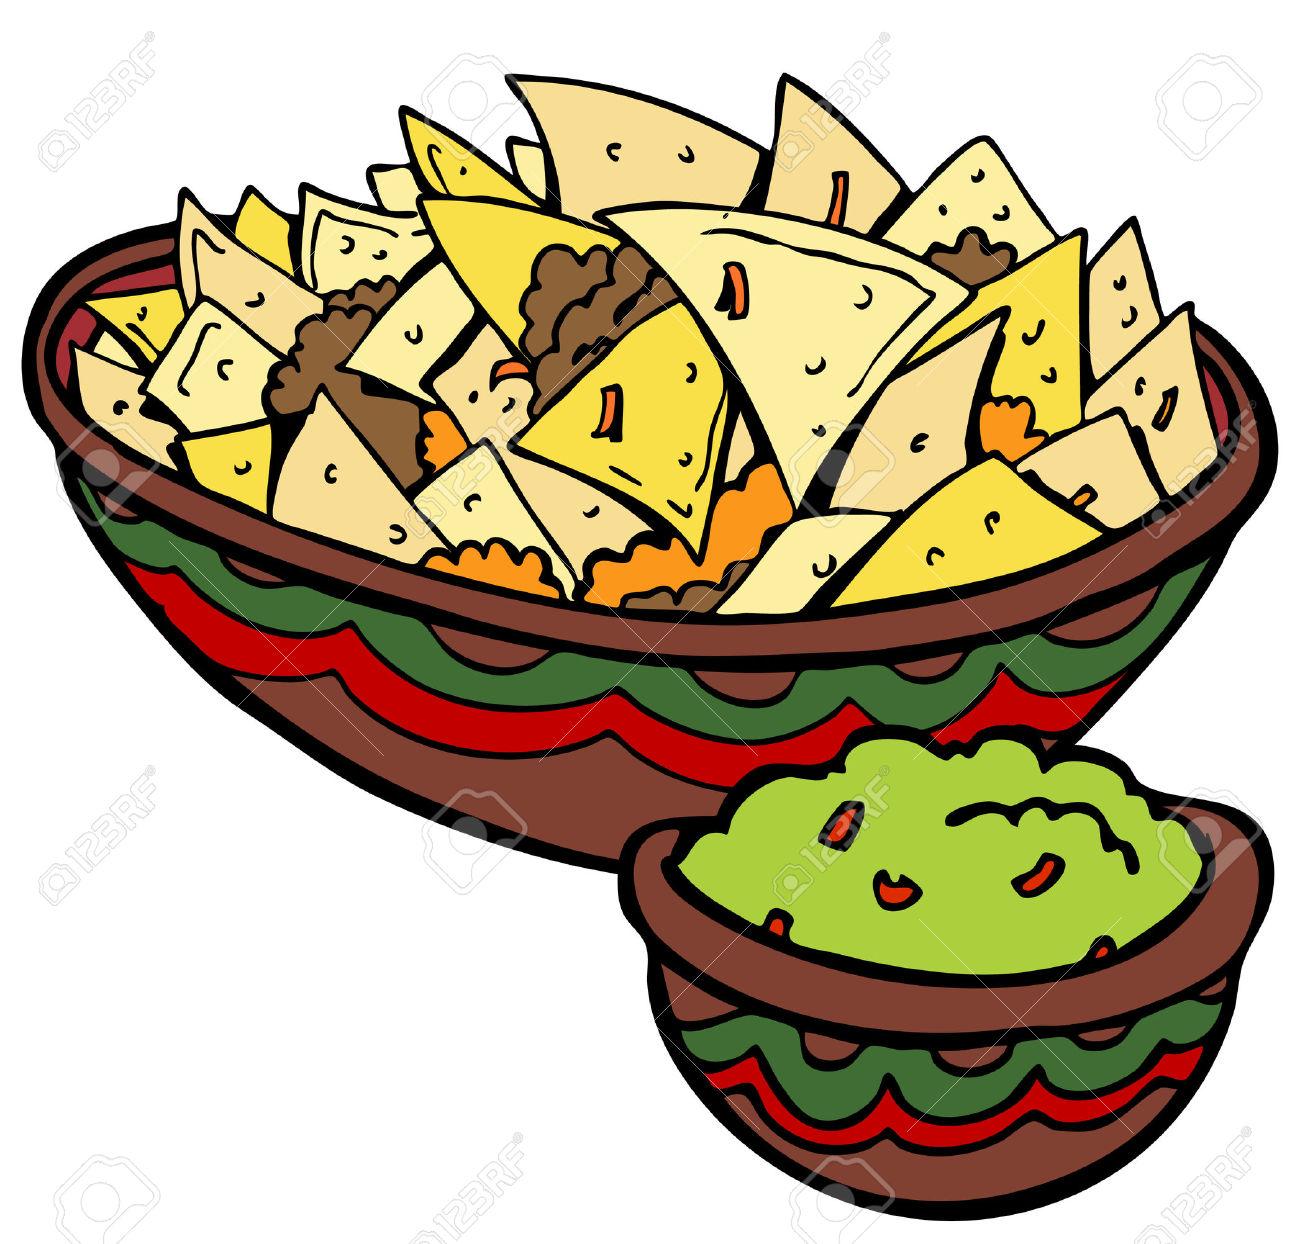 Appetizers clipart italian. Cartoon nachos free download